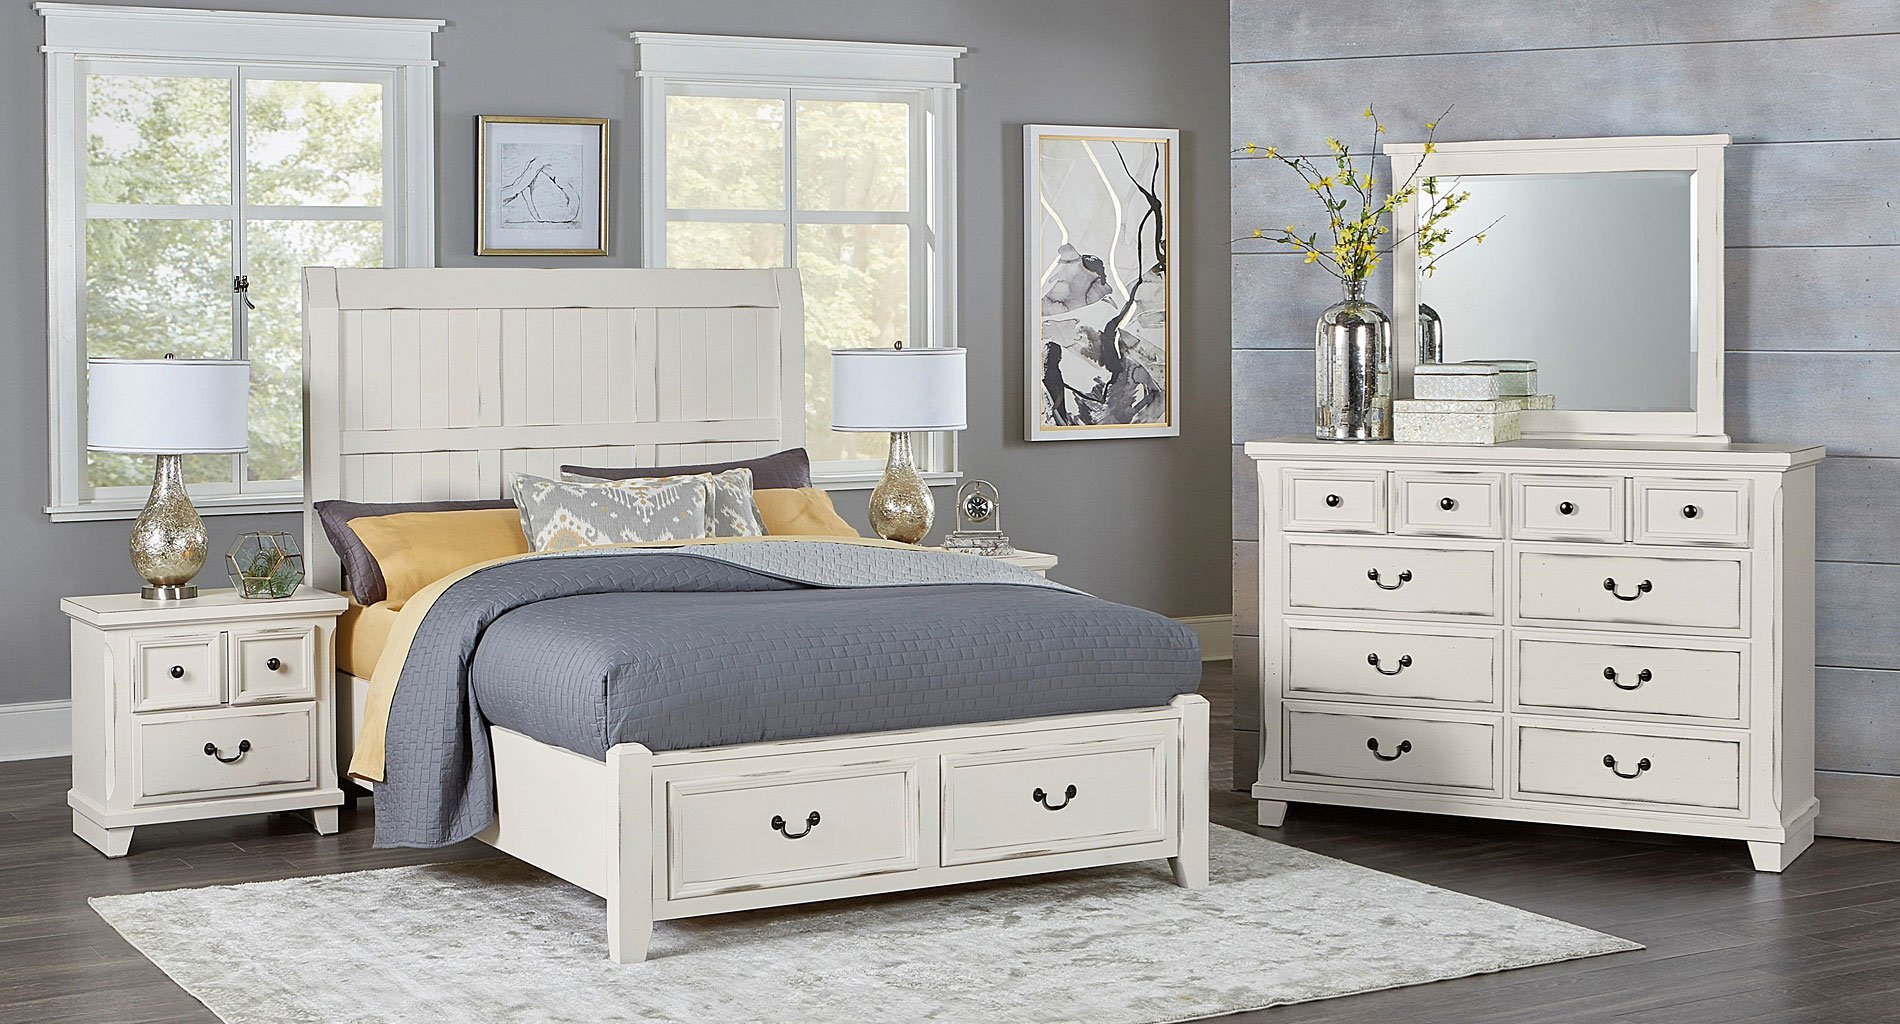 Timber Creek Storage Bedroom Set Distressed White Vaughan Bassett Furniture Cart